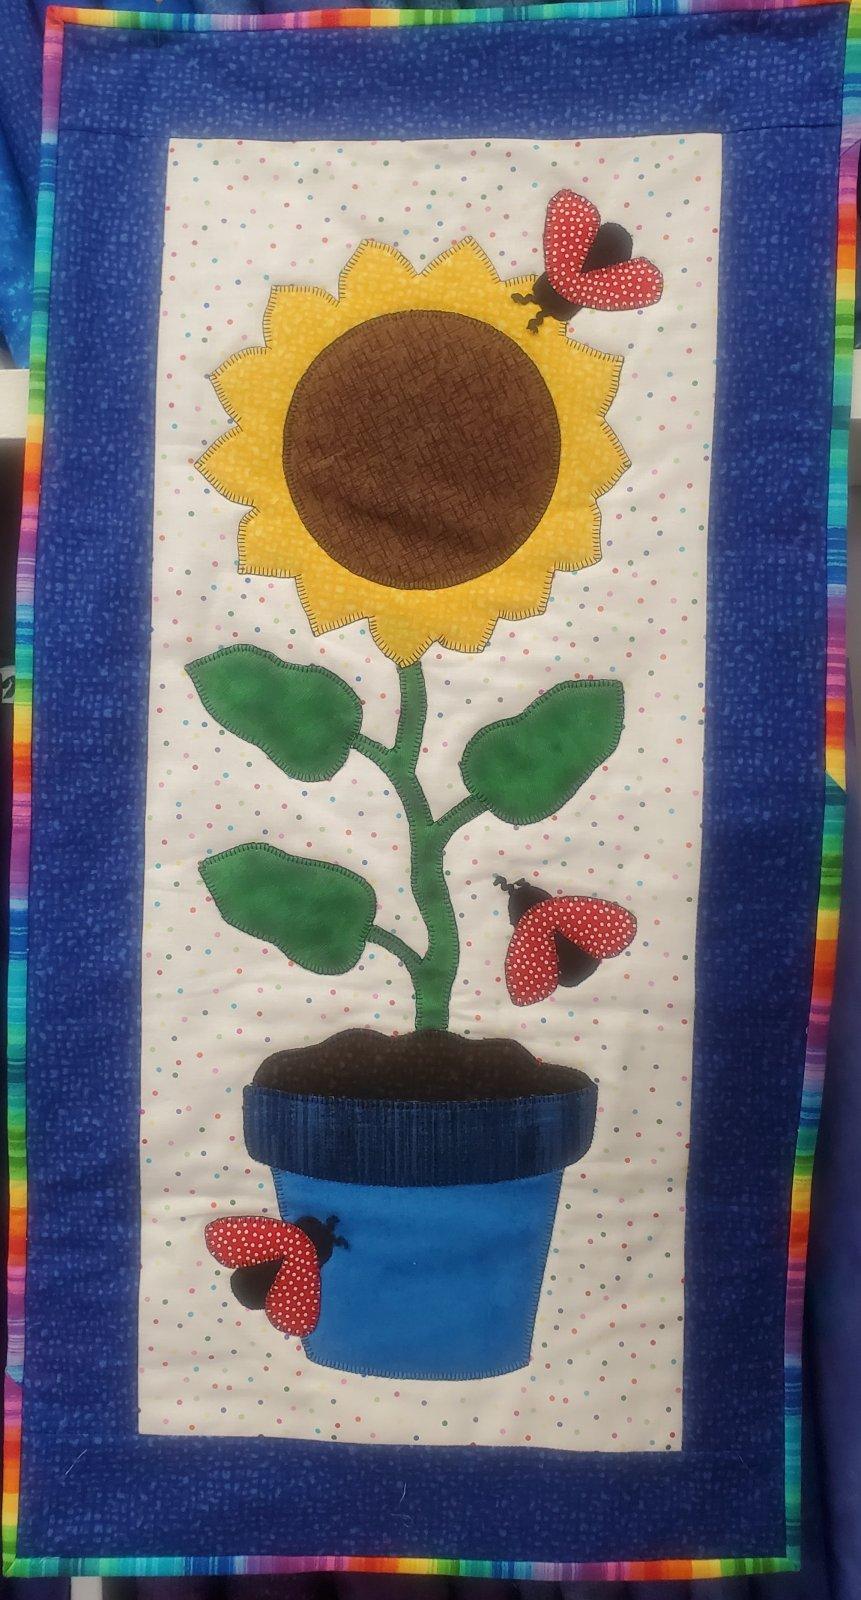 Sunflower Days of Fall Fabric Kit 14x28